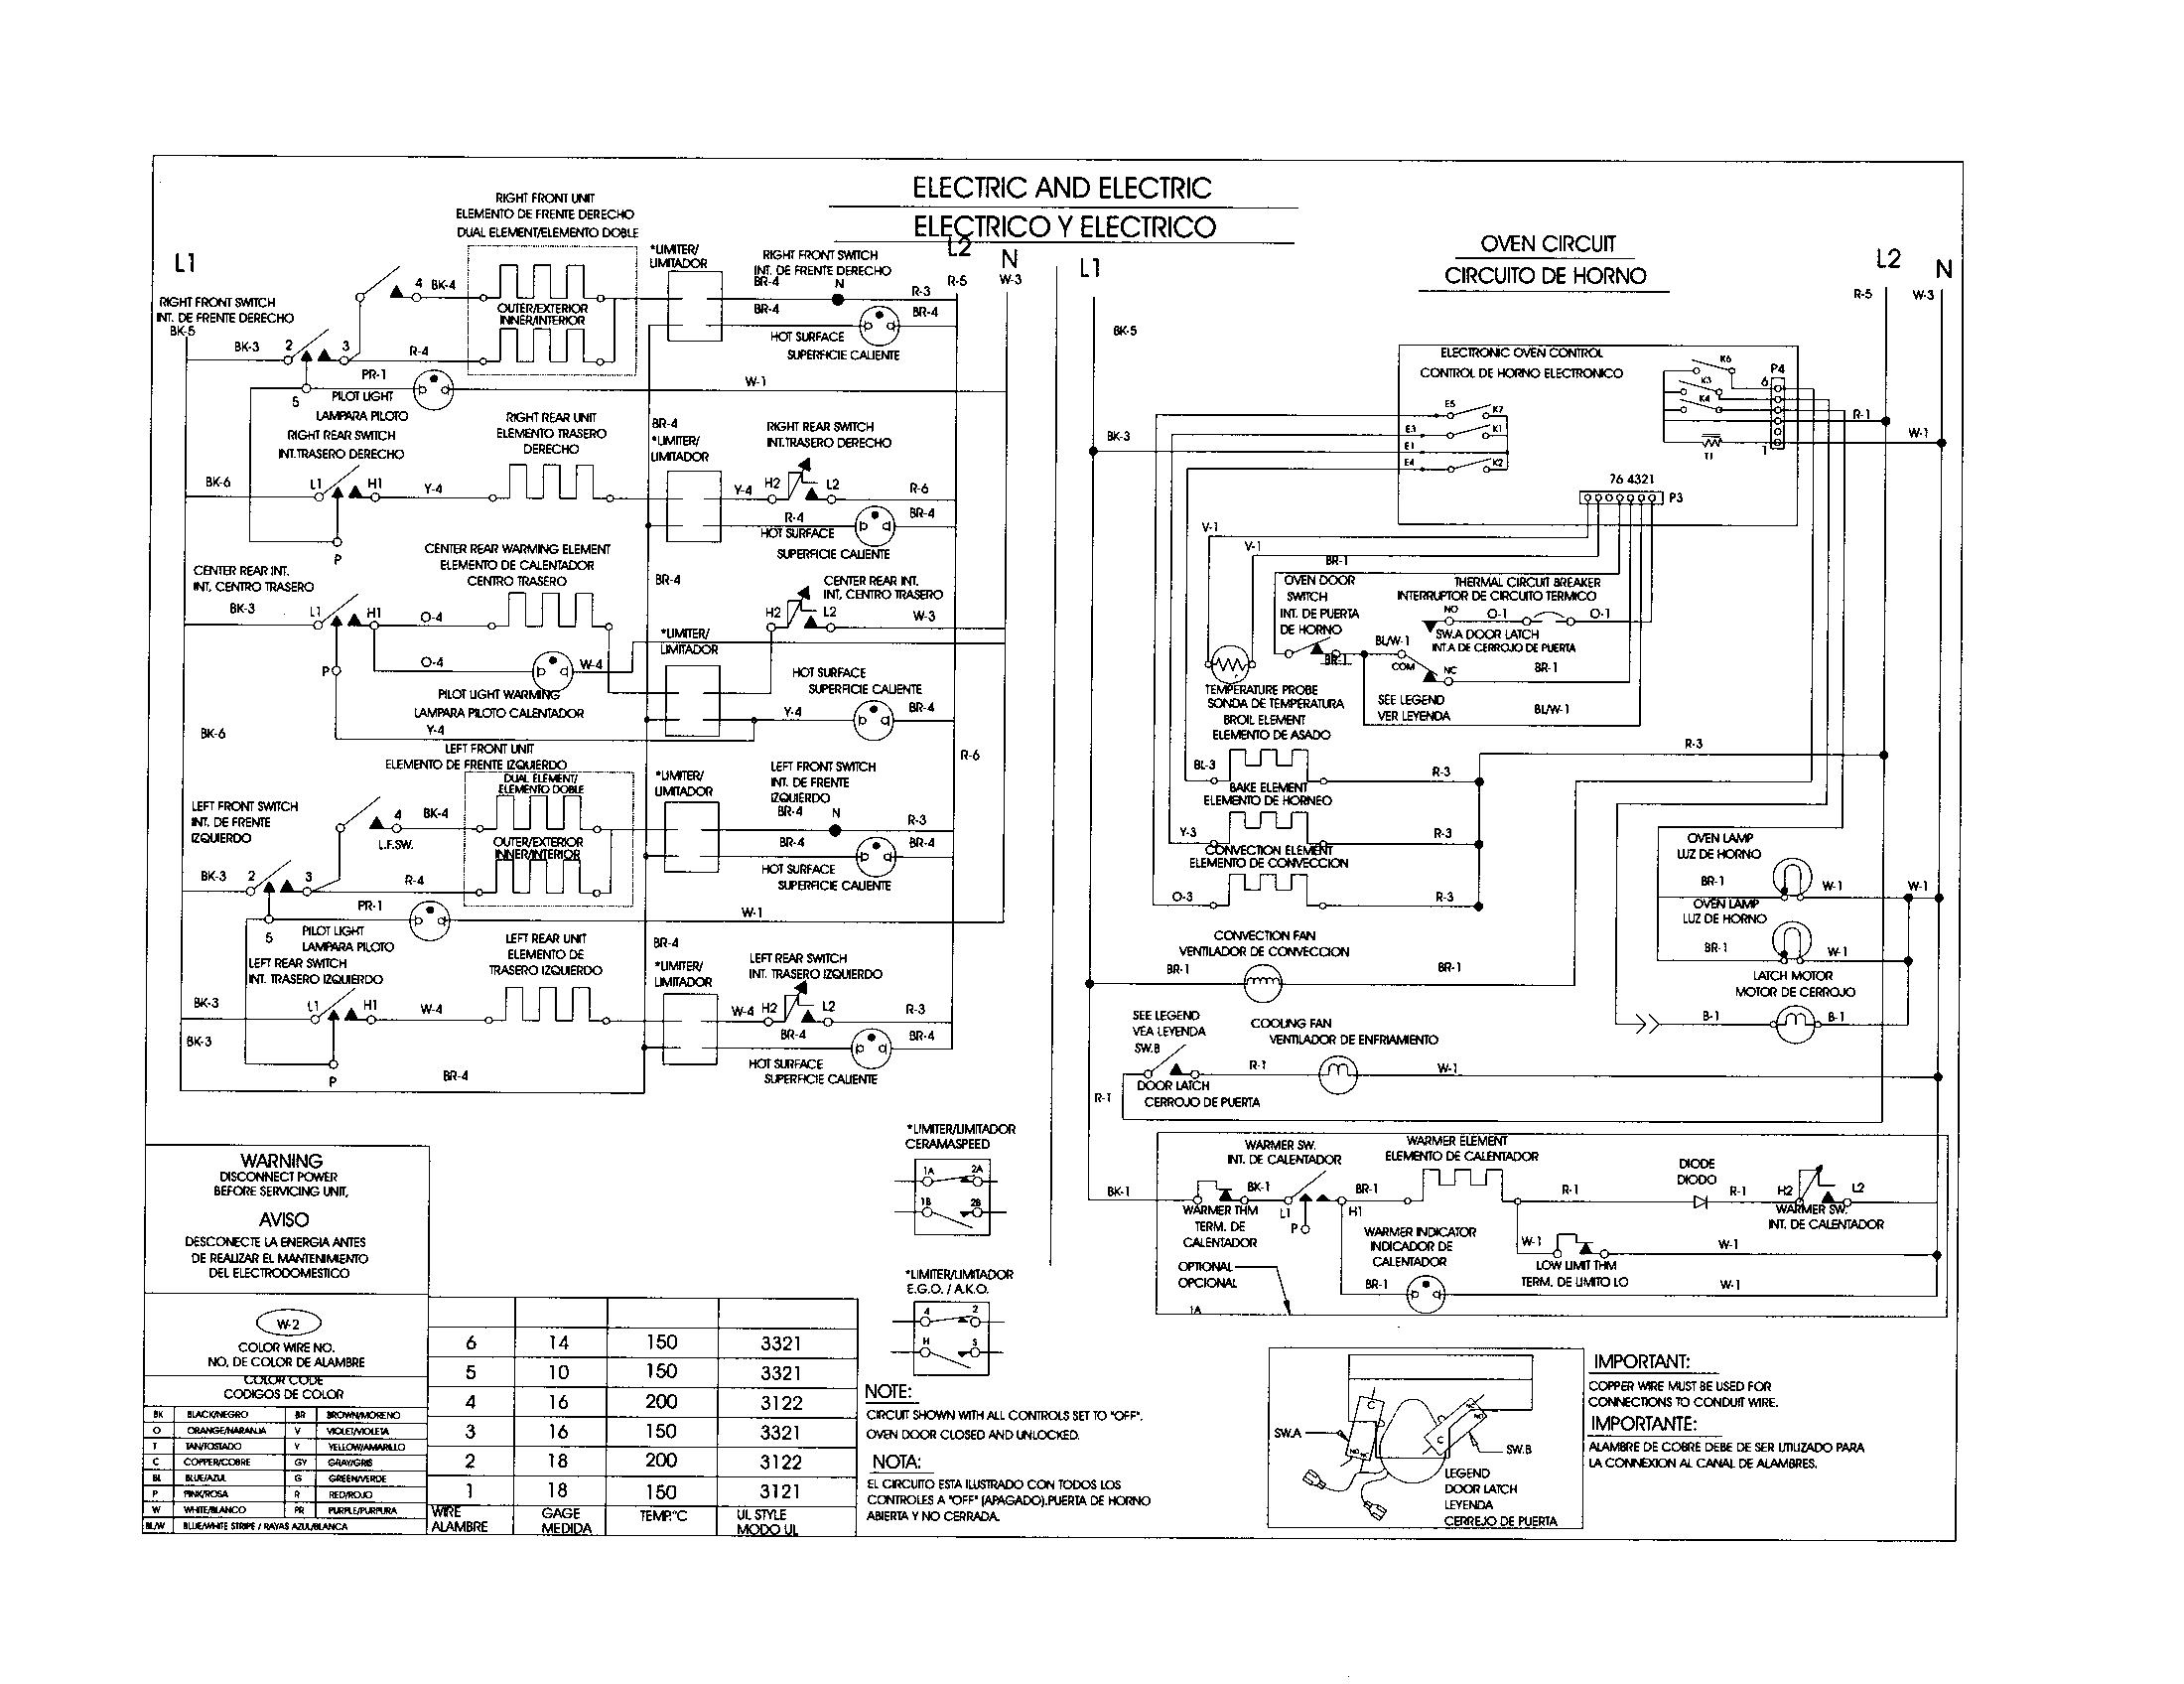 Sears Furnace Wiring Diagram - Wiring Diagrams Bib on samsung wiring diagrams, viking wiring diagrams, hobart wiring diagrams, hotpoint wiring diagrams, dacor wiring diagrams, sears wiring diagrams, panasonic wiring diagrams, lg wiring diagrams, whirlpool wiring diagrams, kitchenaid wiring diagrams, westinghouse wiring diagrams, maytag wiring diagrams, frigidaire wiring diagrams, speed queen wiring diagrams, eaton wiring diagrams, ge wiring diagrams, craftsman wiring diagrams, buckley wiring diagrams, gibson wiring diagrams, amana wiring diagrams,